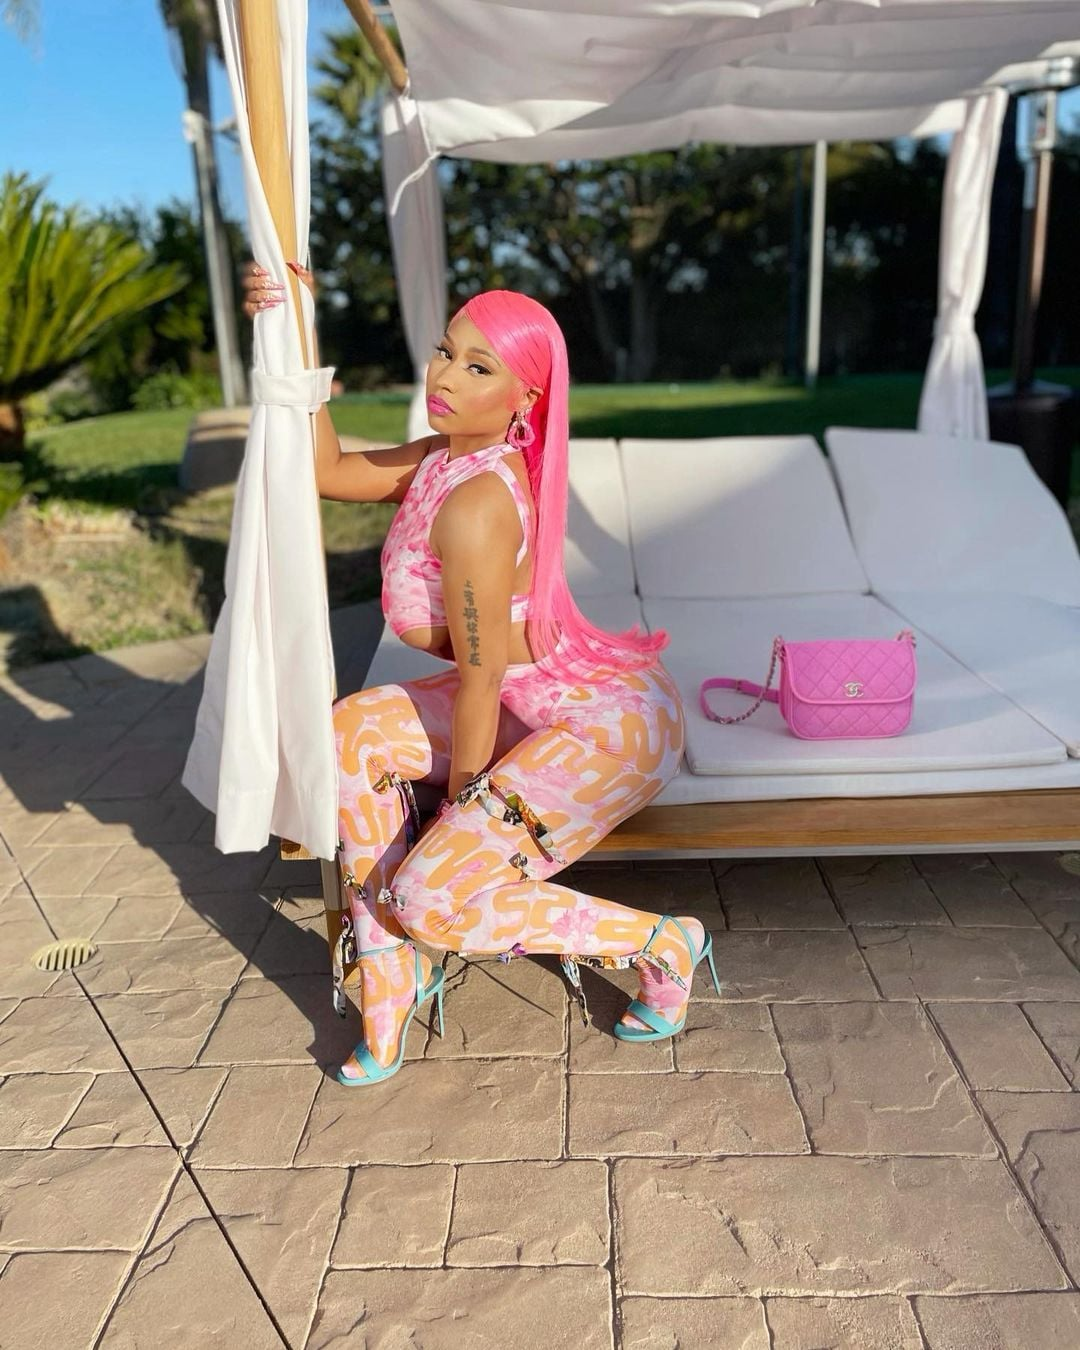 nicki-minaj-wore-pink-jumpsuit-instagram